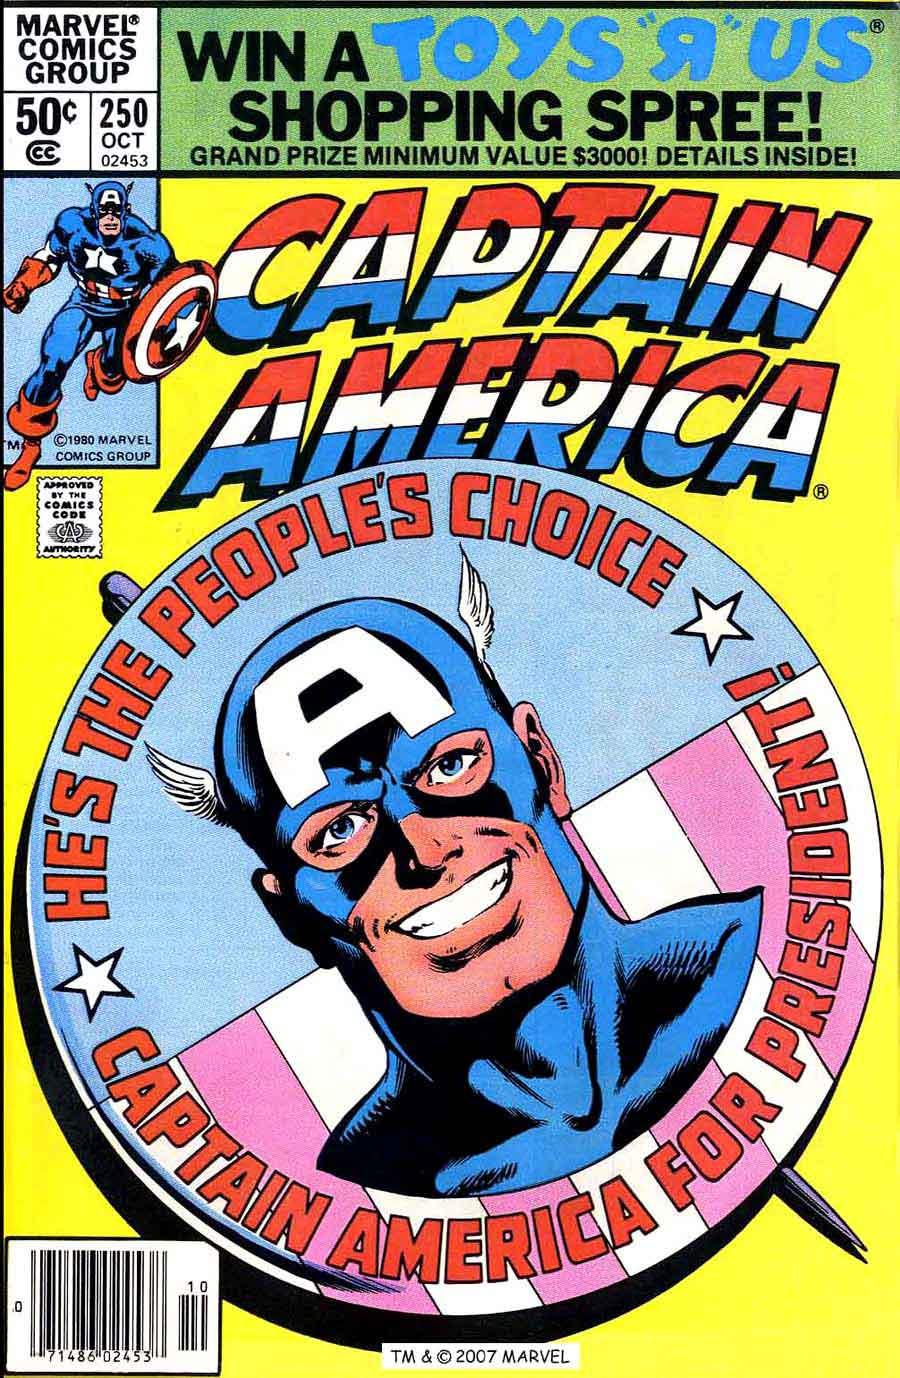 Captain America #250 marvel 1980s bronze age comic book cover art by John Byrne